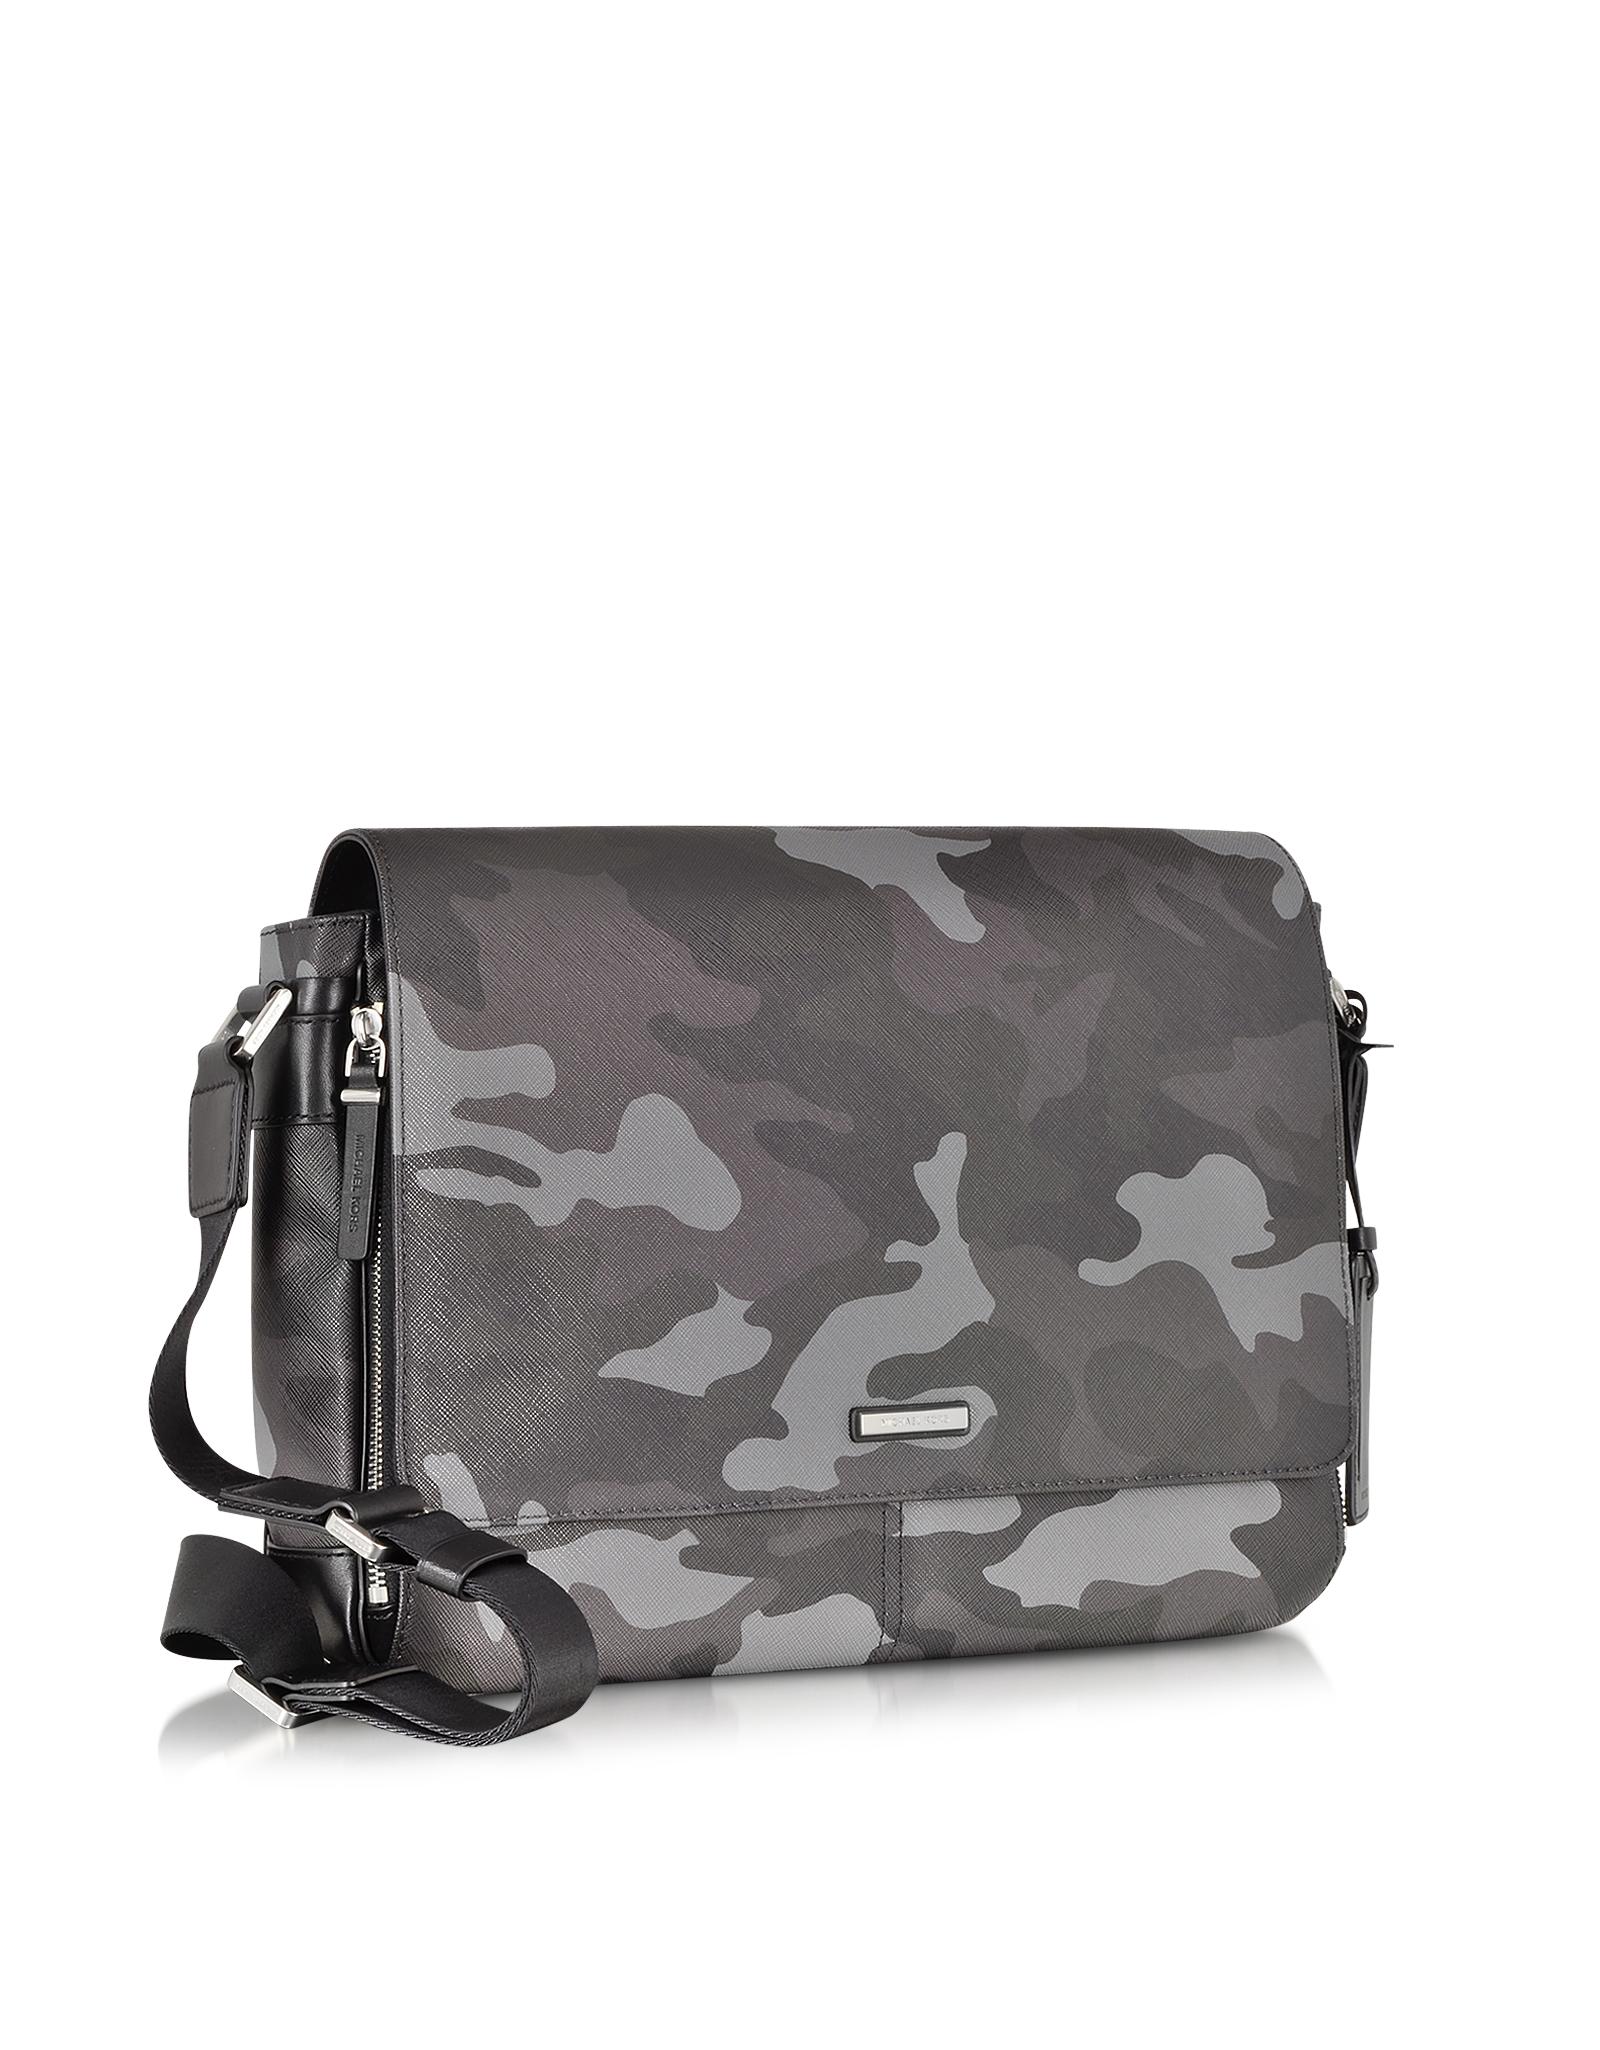 486b42a2eab8 Michael Kors Jet Set Men S Grey Camouflage Messenger Bag in Gray for ...